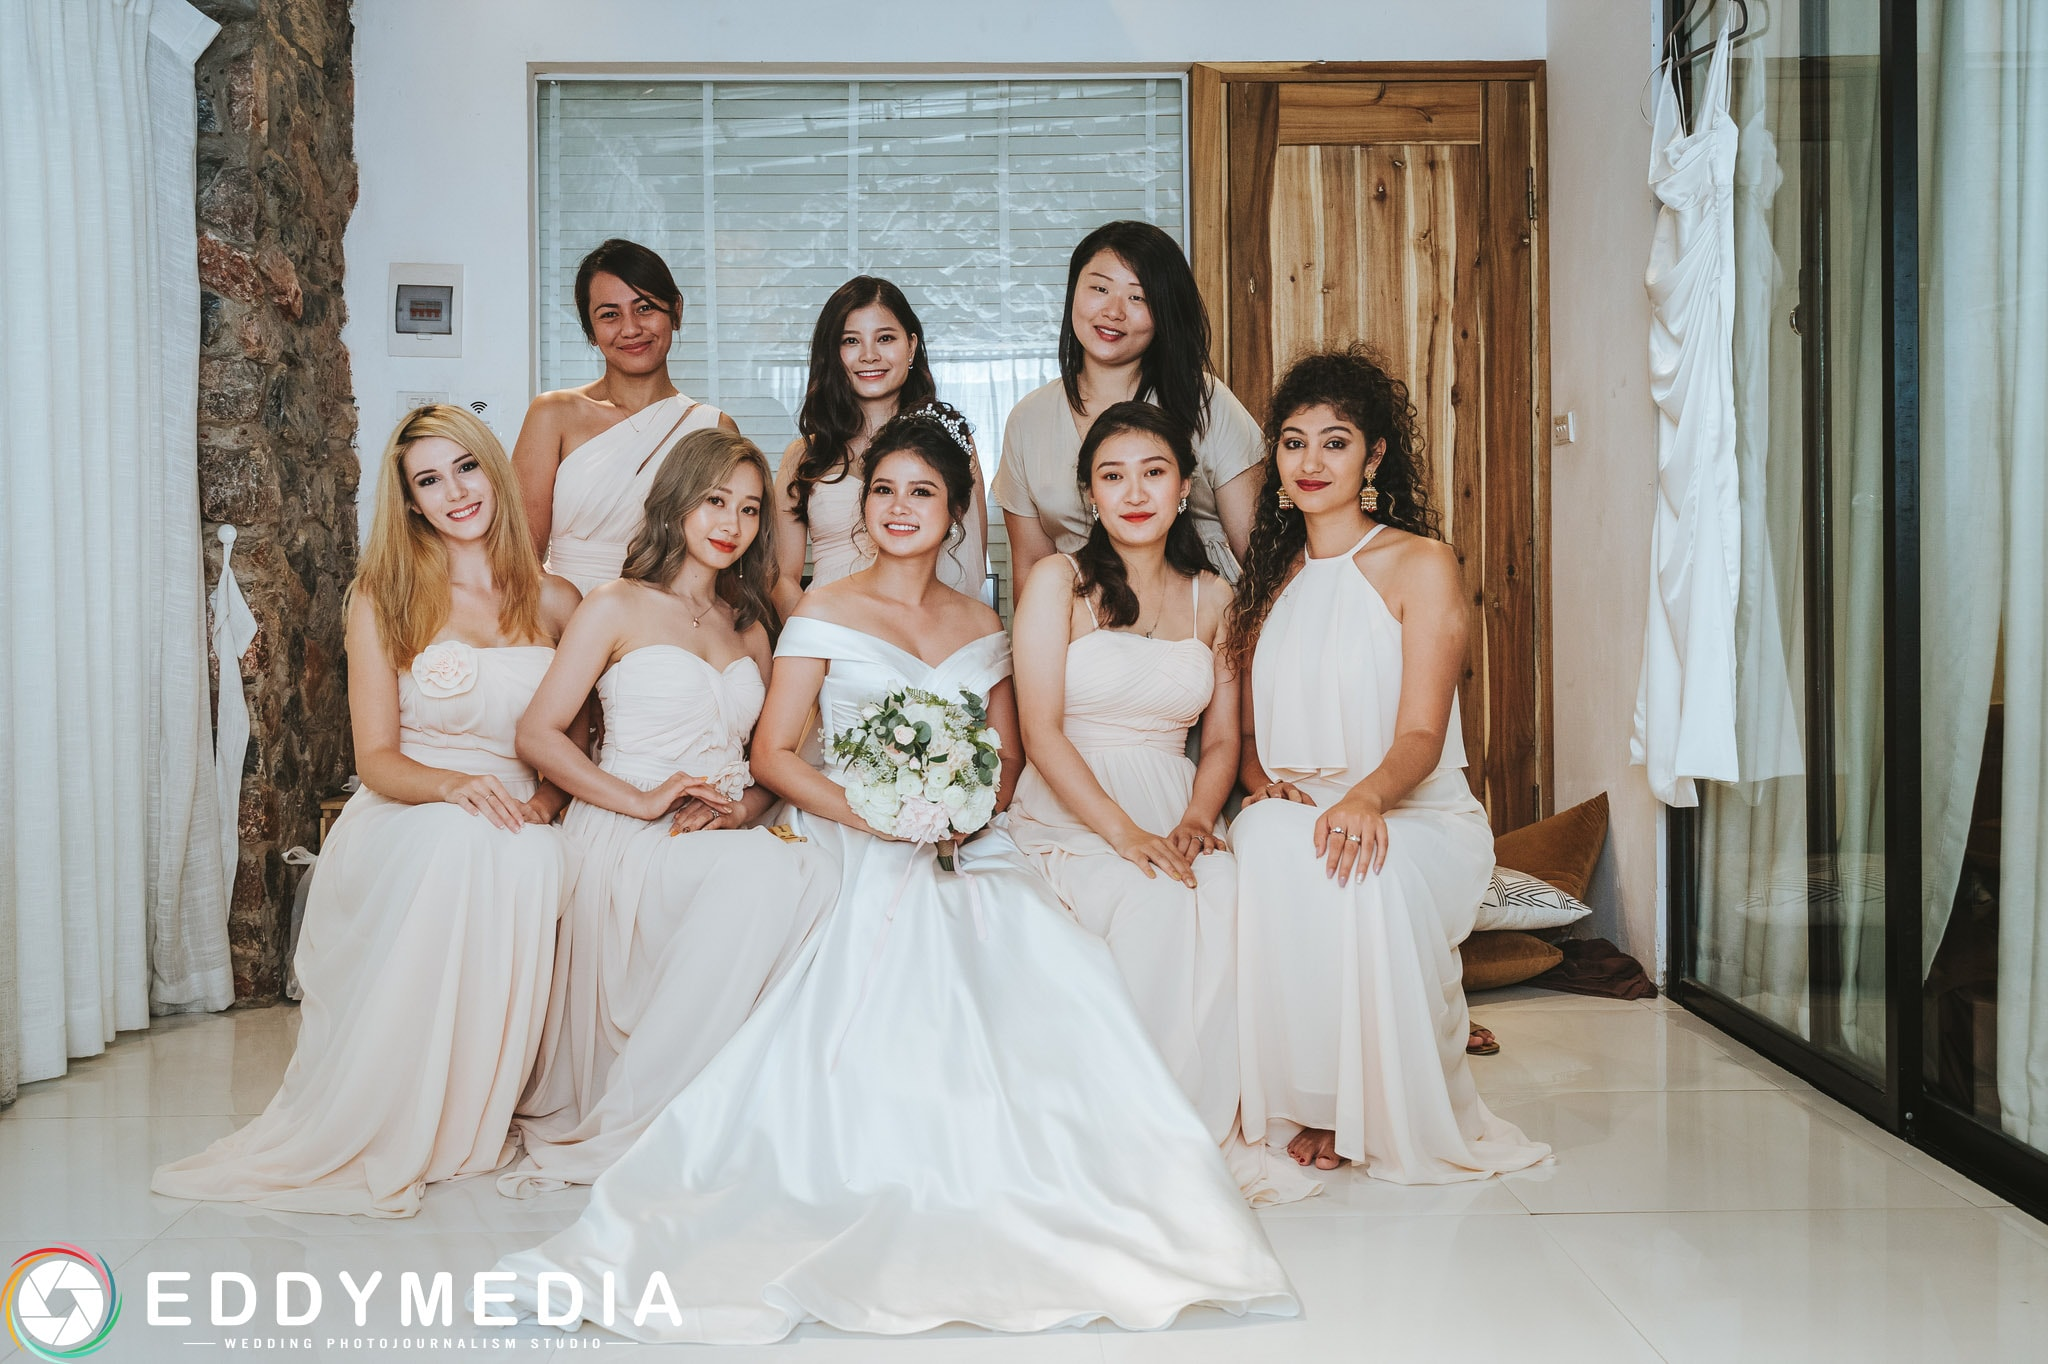 Phongsucuoi James KieuThuy EddyMedia 20 tiệc cưới ngoài trời